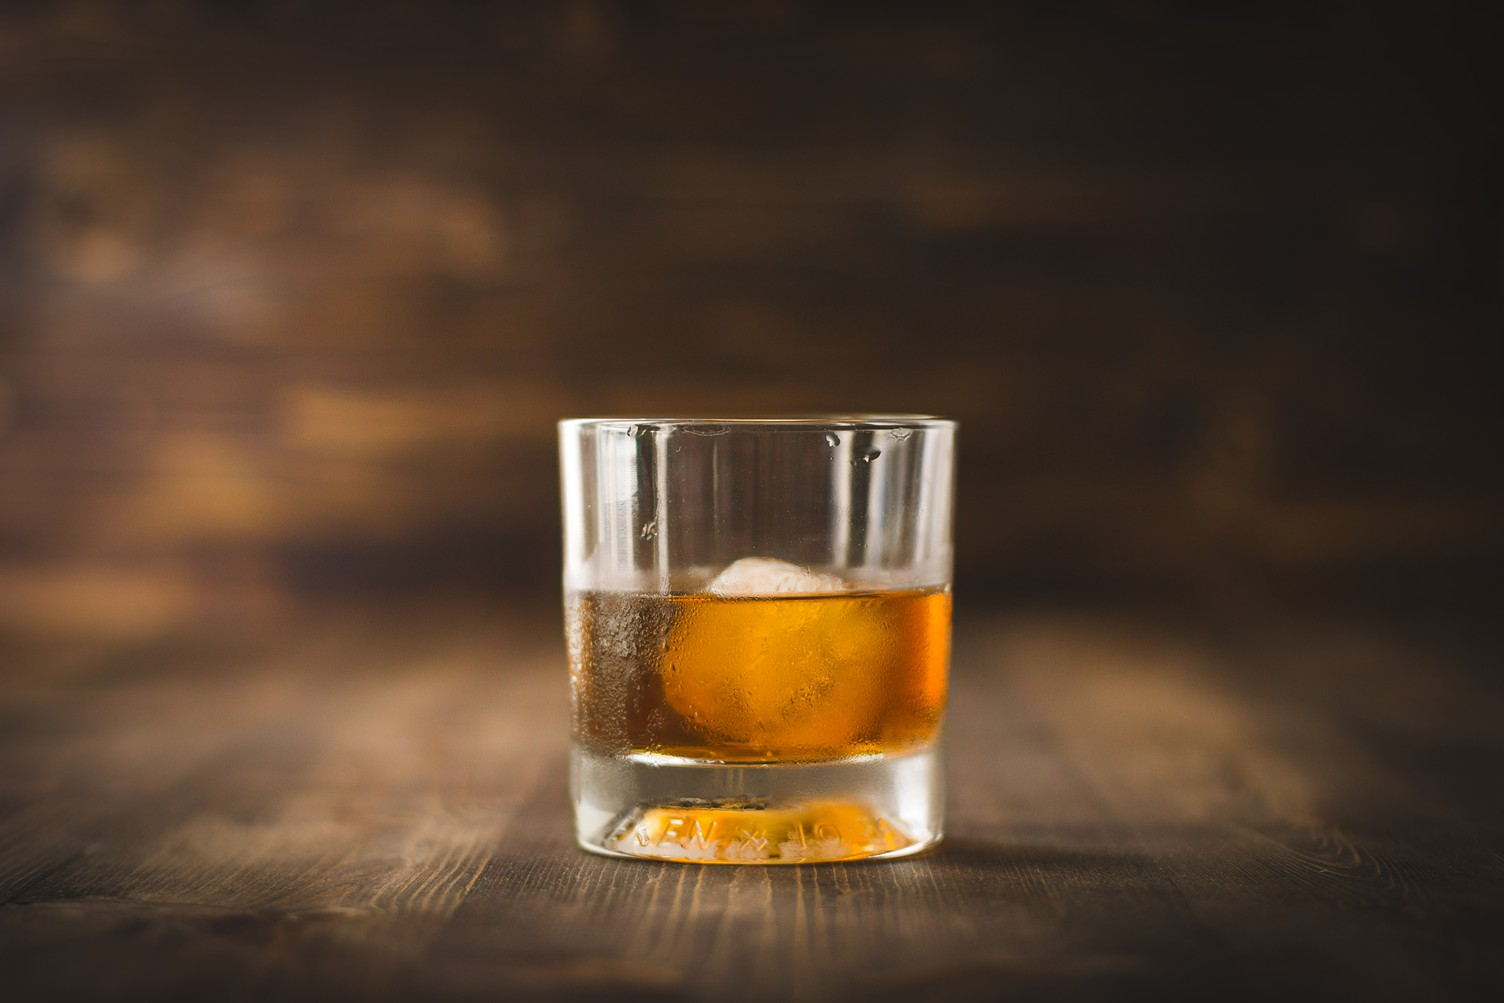 Handcraft Kitchen & Cocktails Hosts Jura Whisky Master Distiller Thurs. Nov. 21 photo